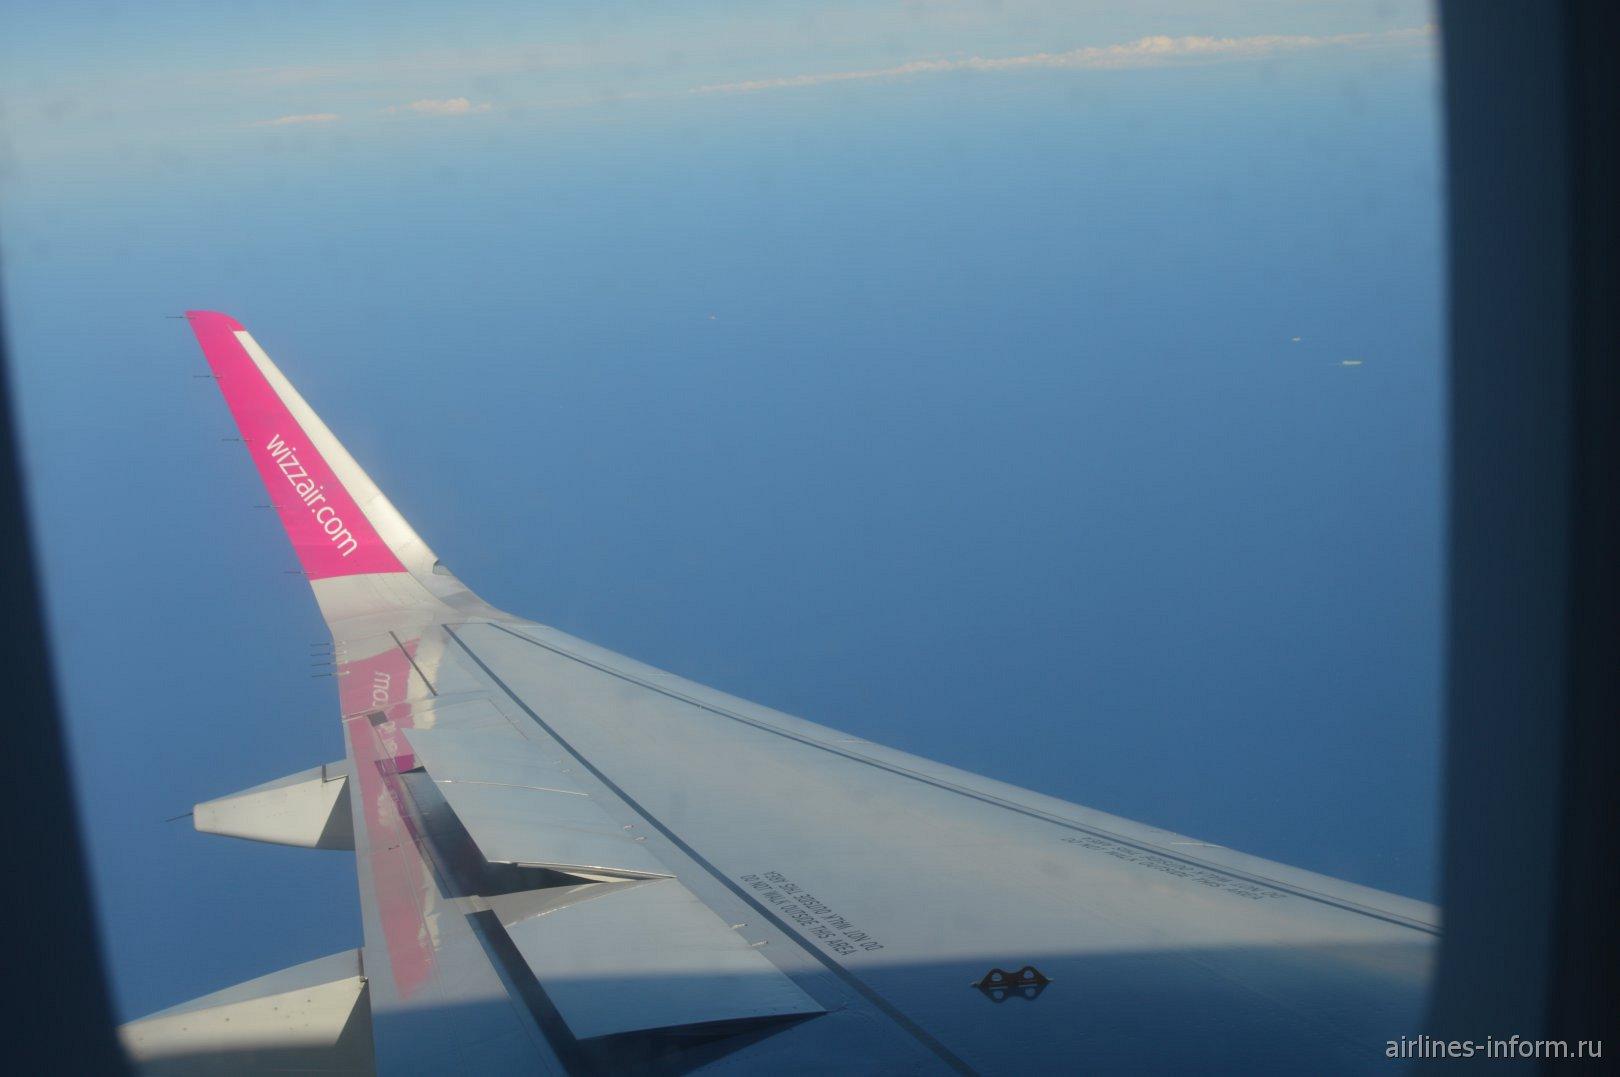 Вот и Средиземное море